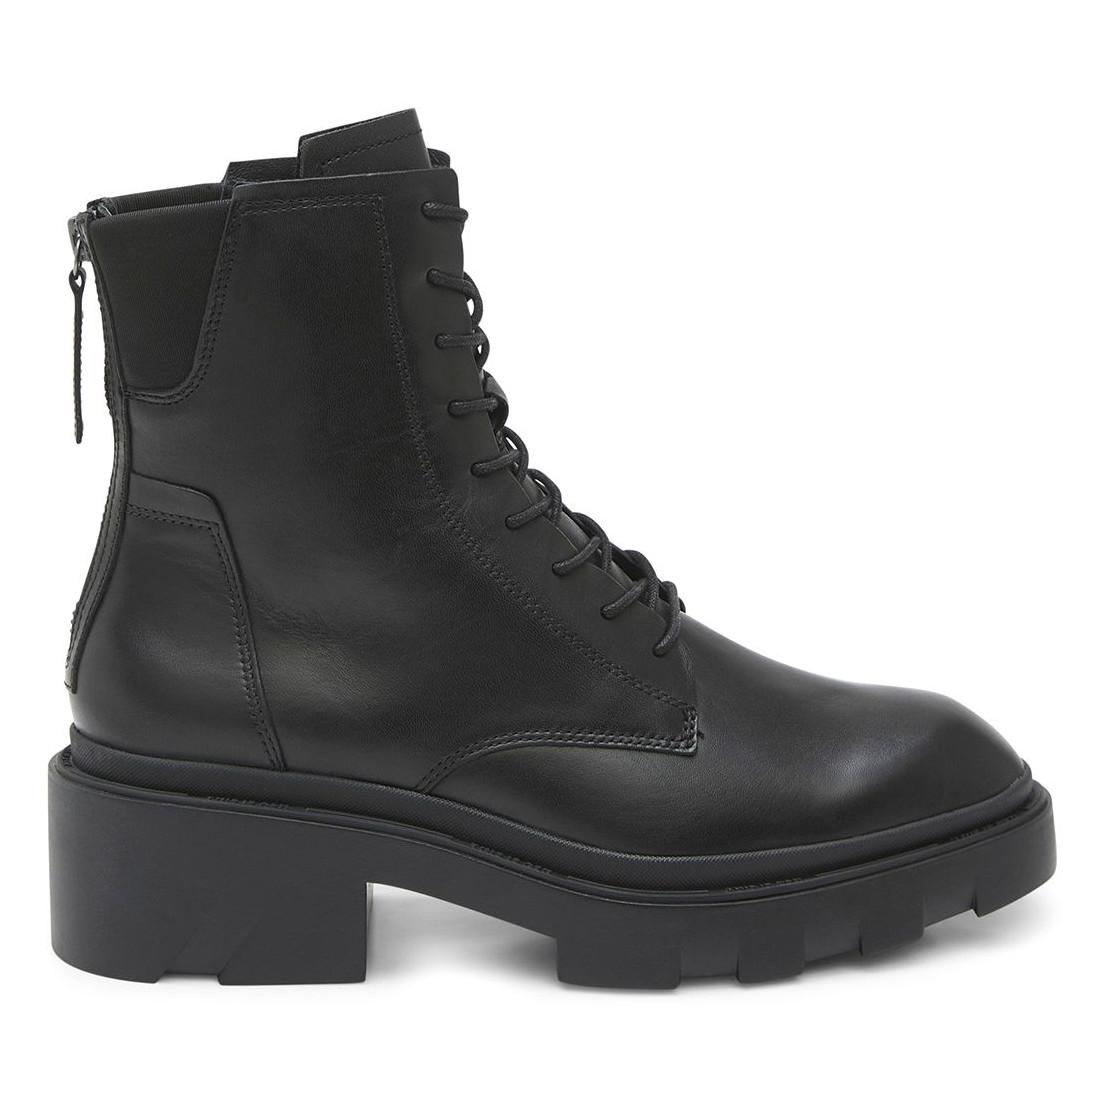 military boots woman ash moody01 mustang black 7985